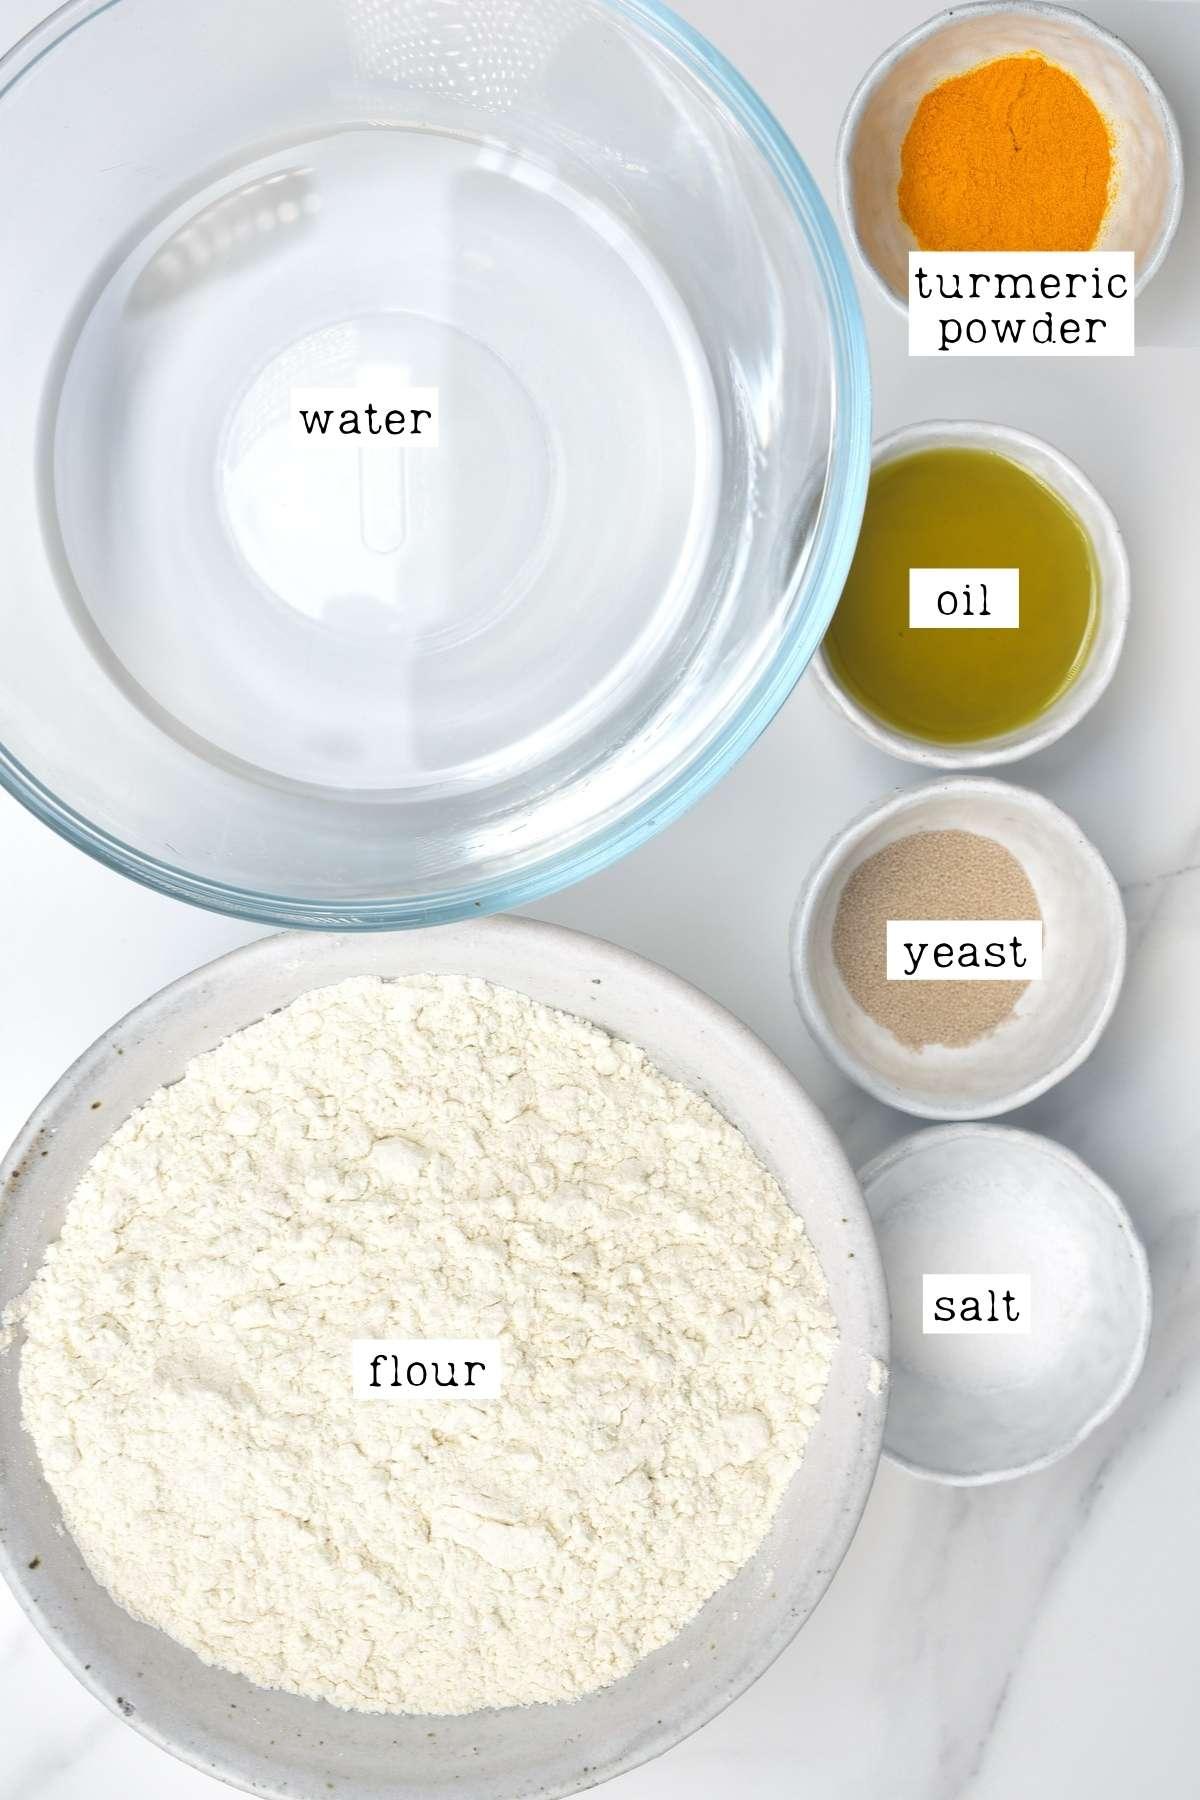 Ingredients for turmeric focaccia